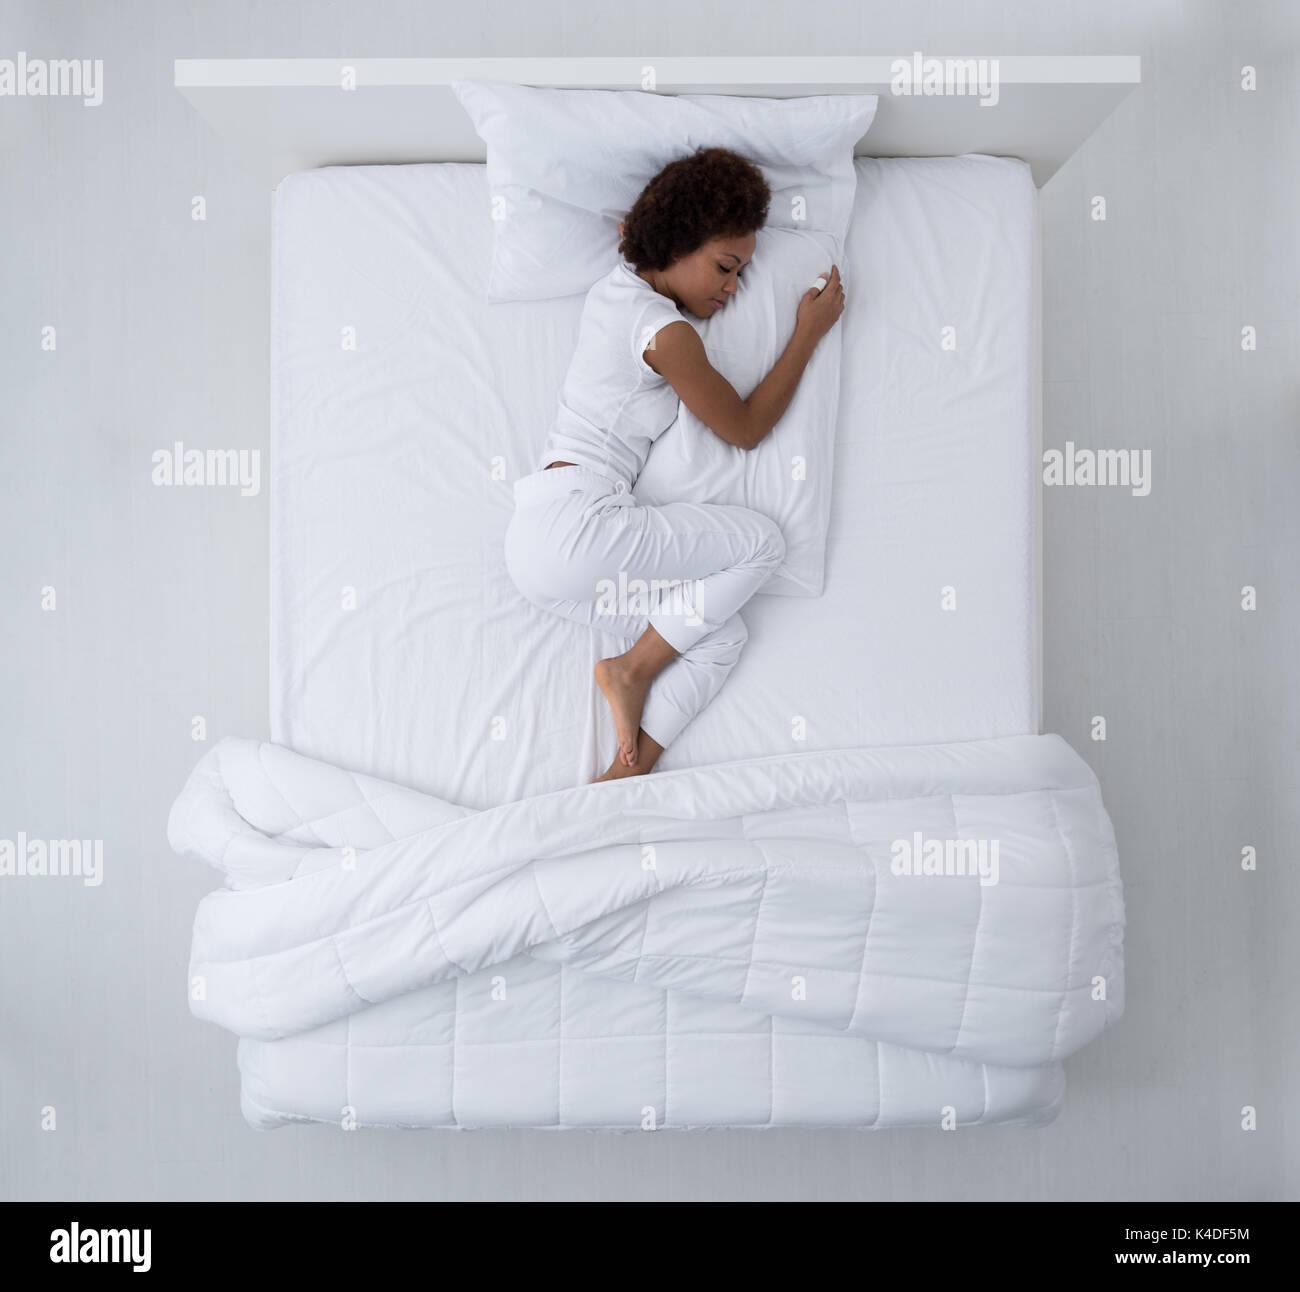 https://c8.alamy.com/comp/K4DF5M/beautiful-african-american-woman-lying-in-bed-and-sleeping-top-view-K4DF5M.jpg